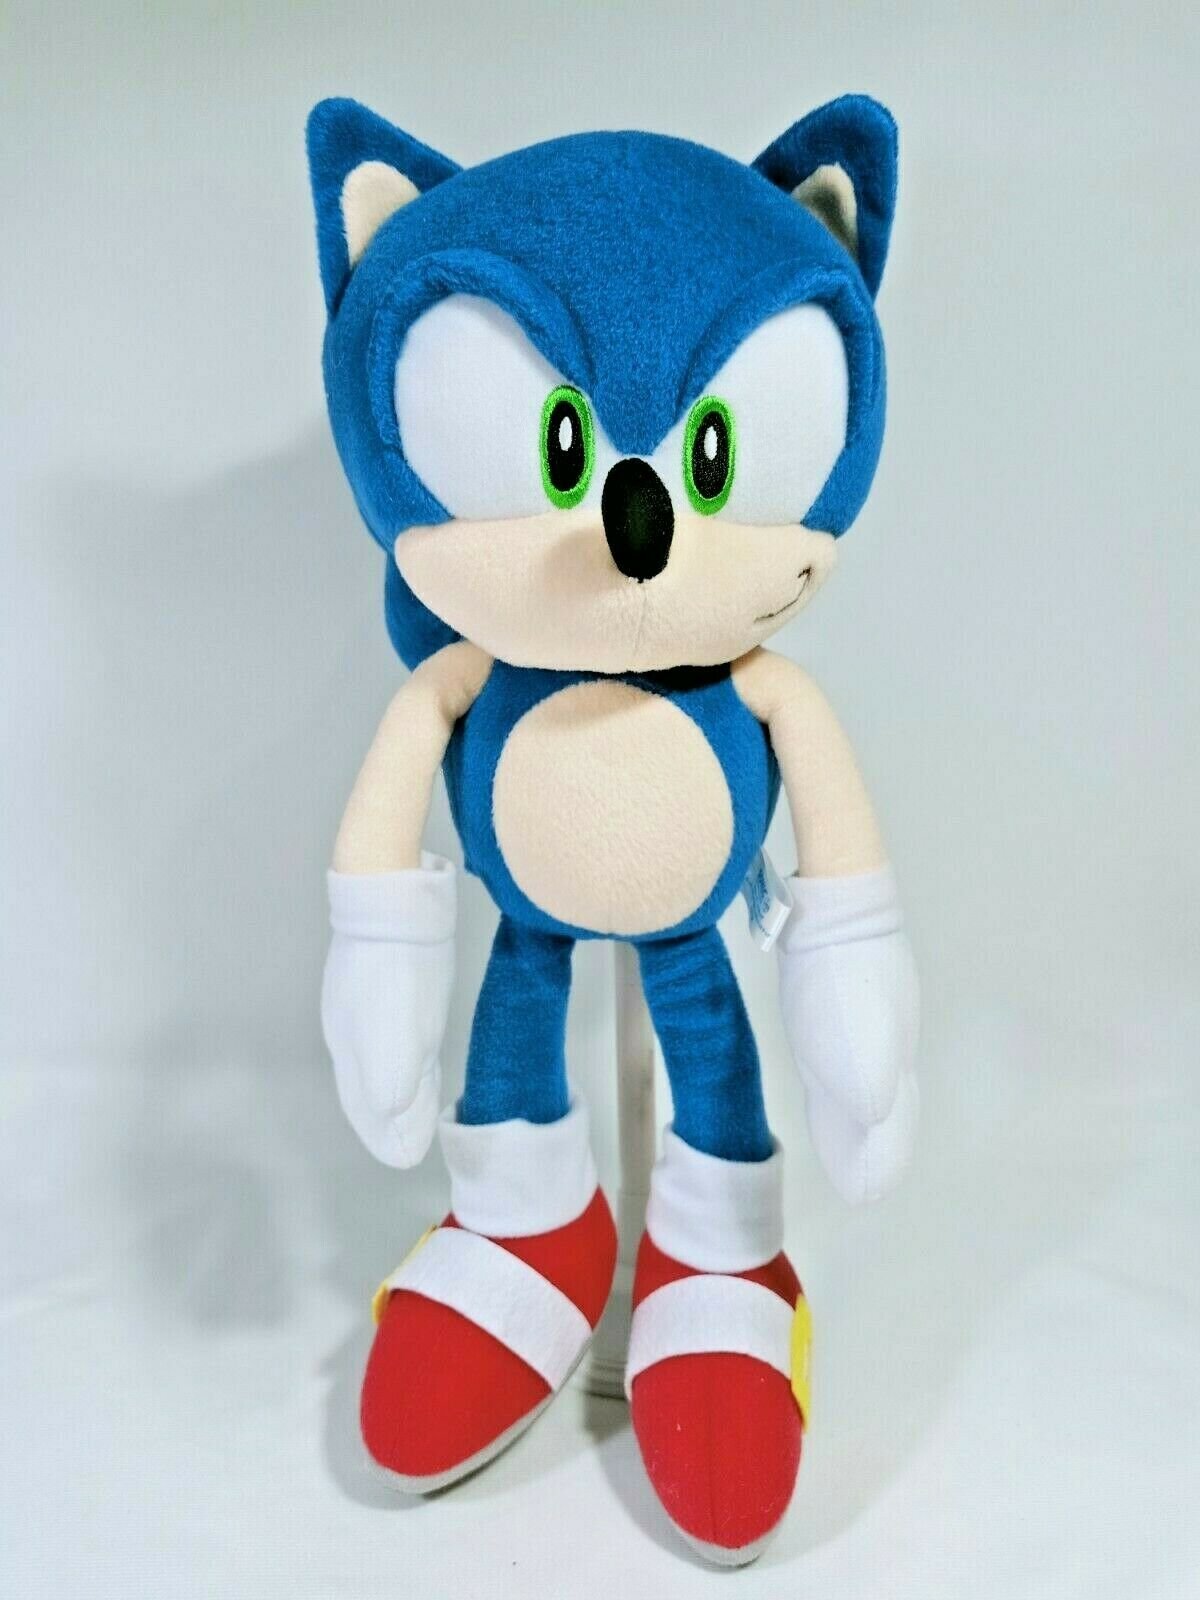 SEGA Sonic Hedgehog Plush Doll Joypolis White Saturn Megadrive Genesis Japan 15